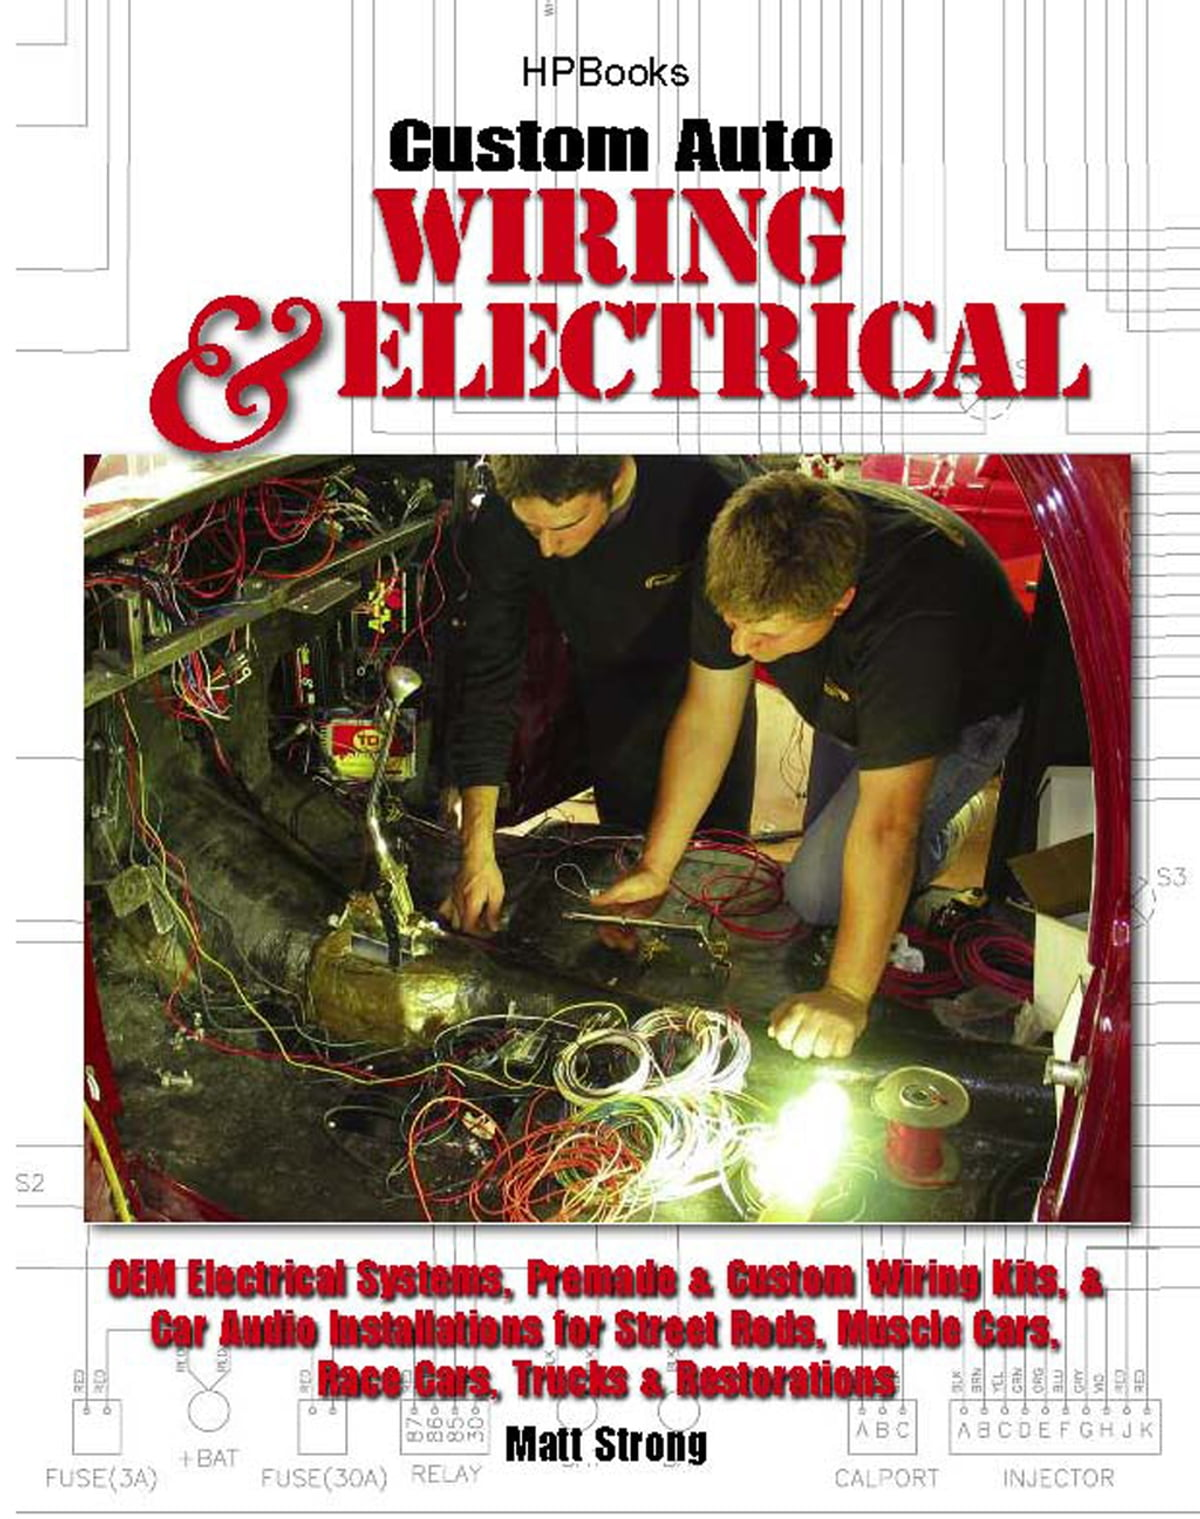 hight resolution of custom auto wiring electrical hp1545 ebook by matt strong 9781101046289 rakuten kobo